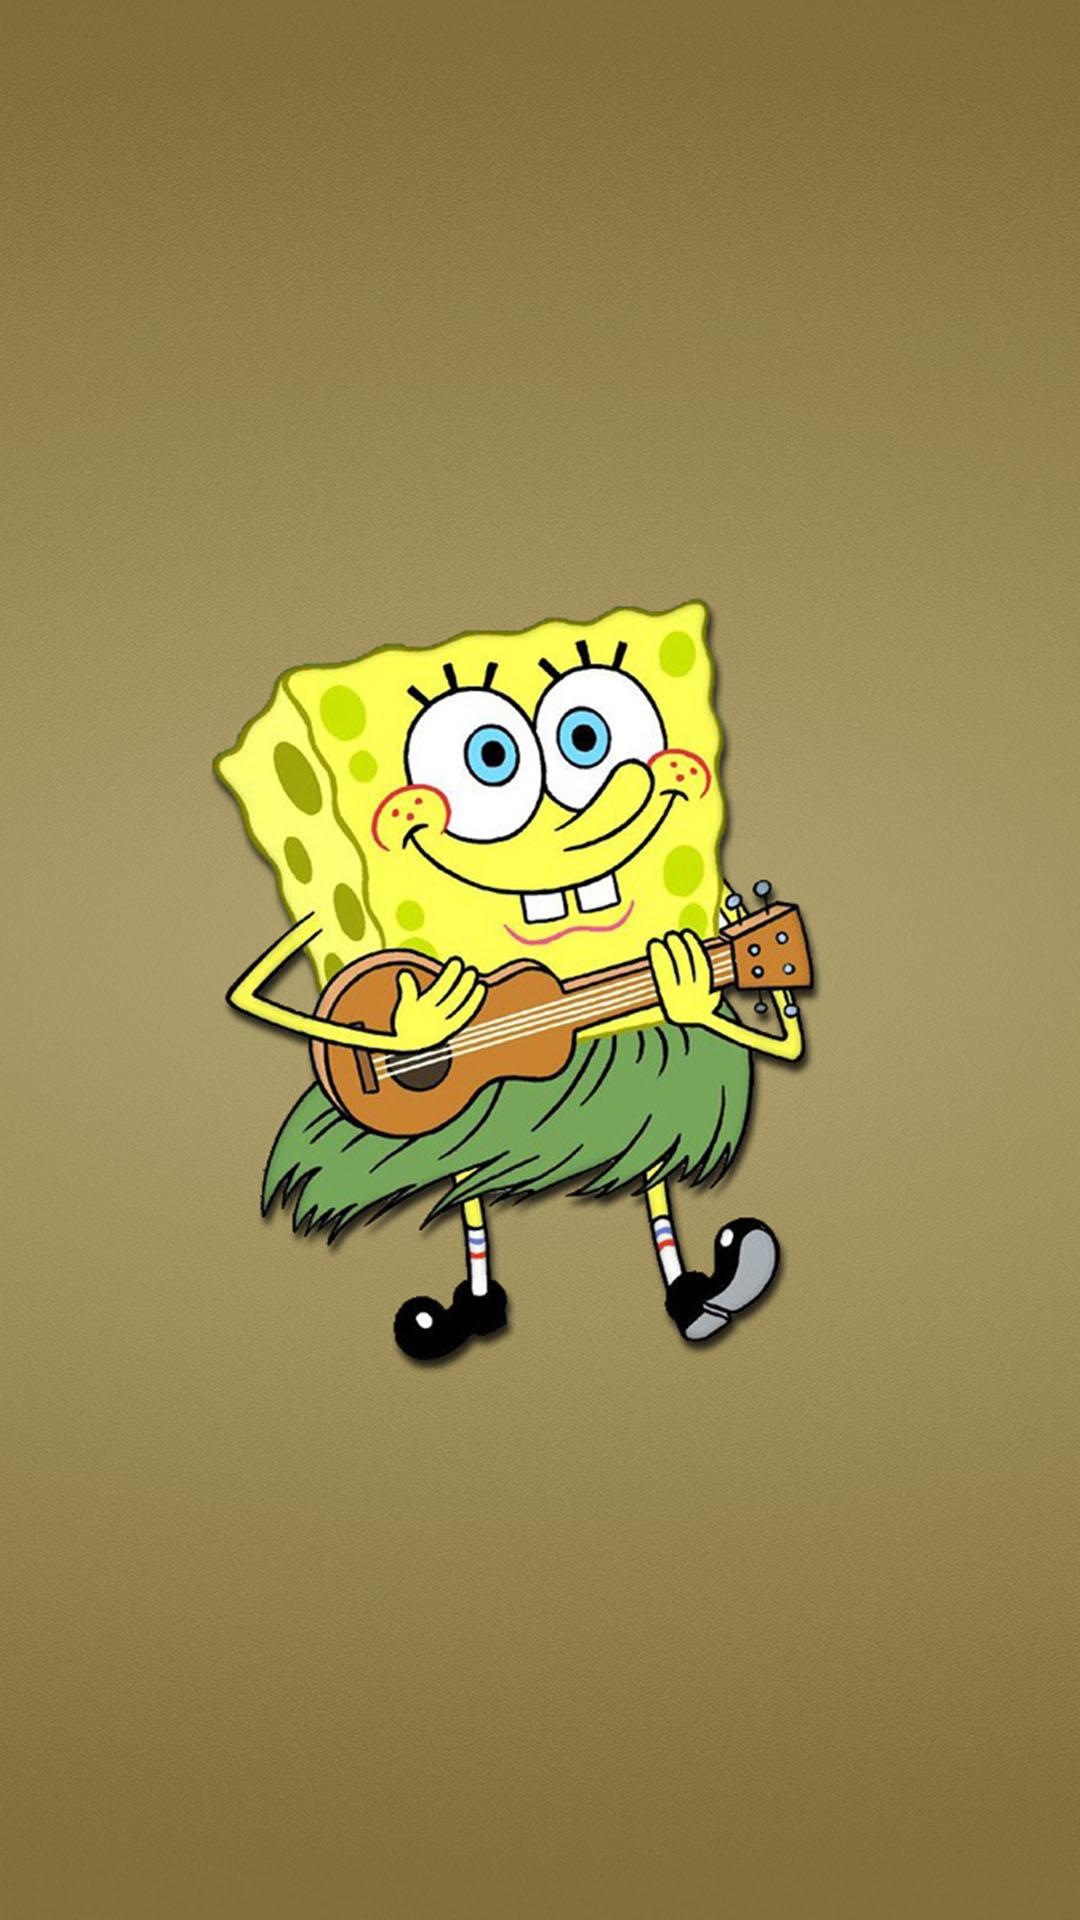 Spongebob Guitar Funny Wallpaper